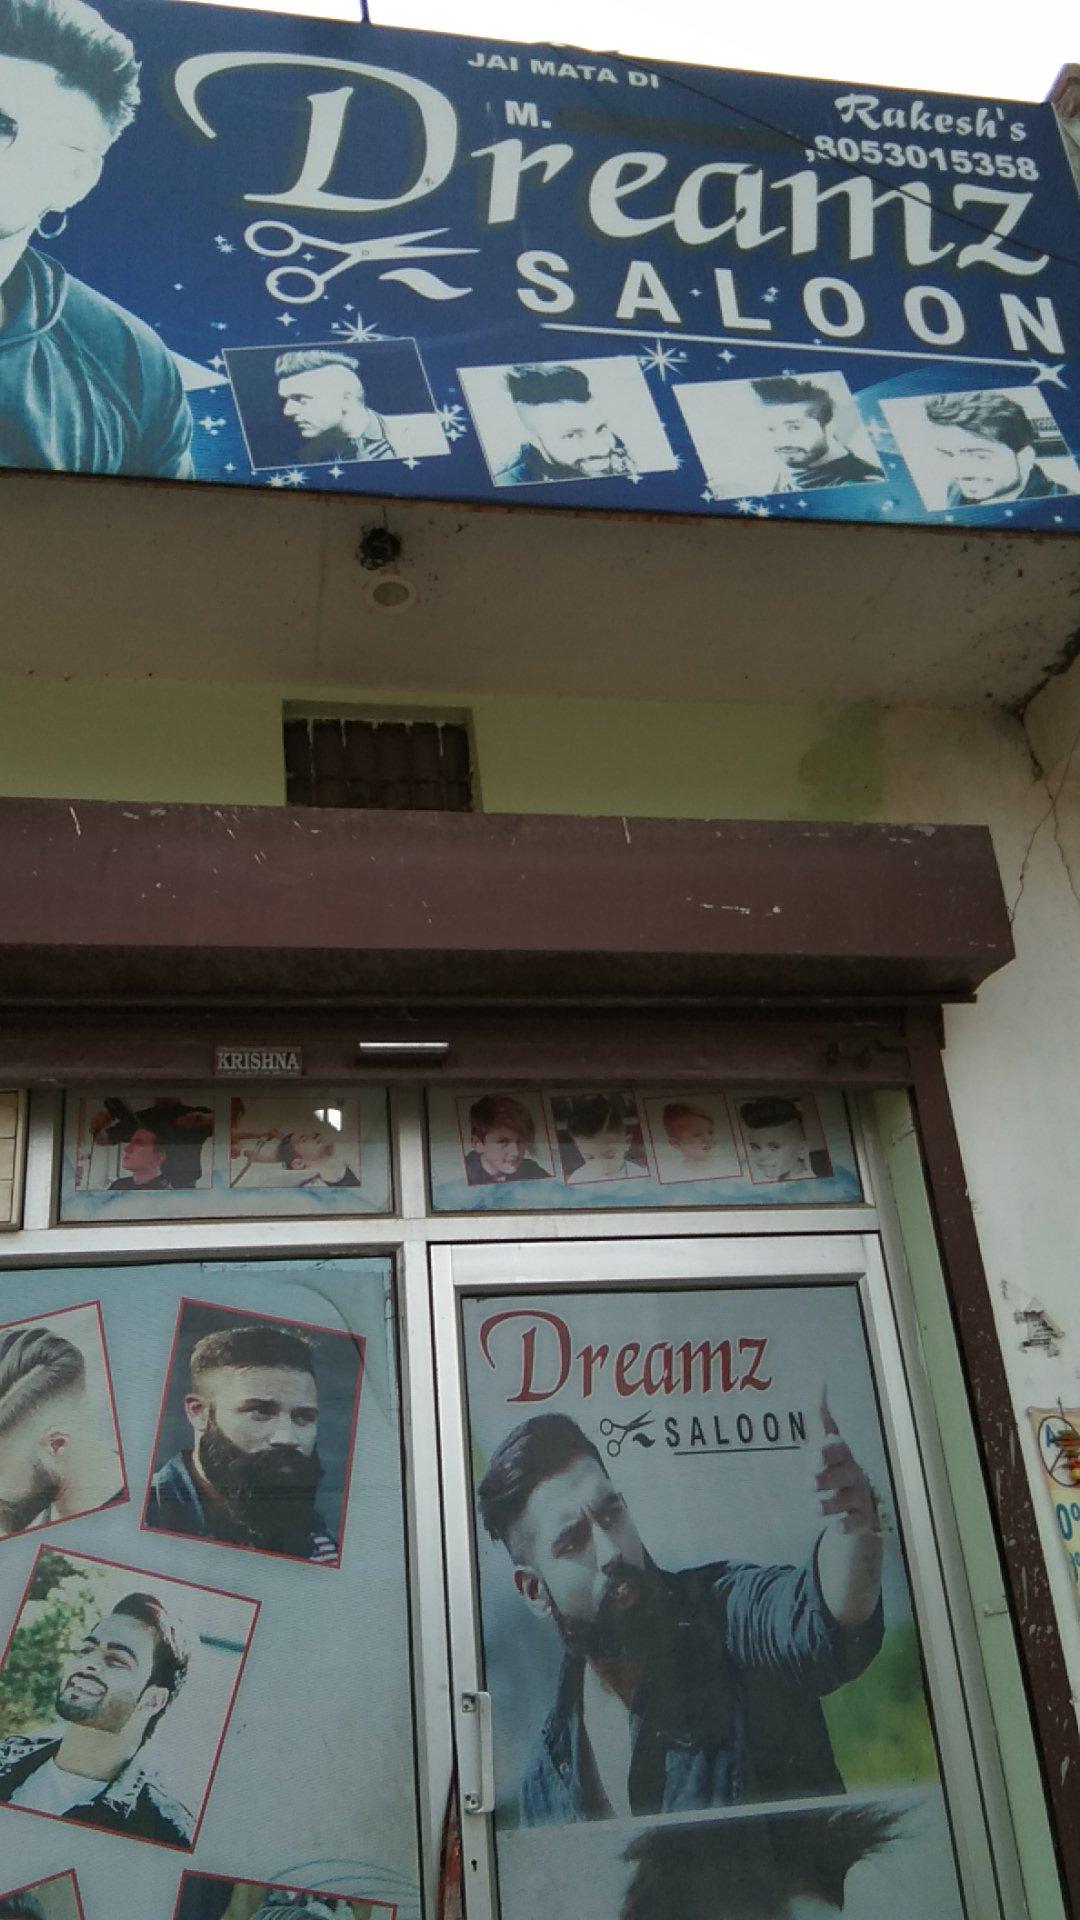 Dreamz Saloon